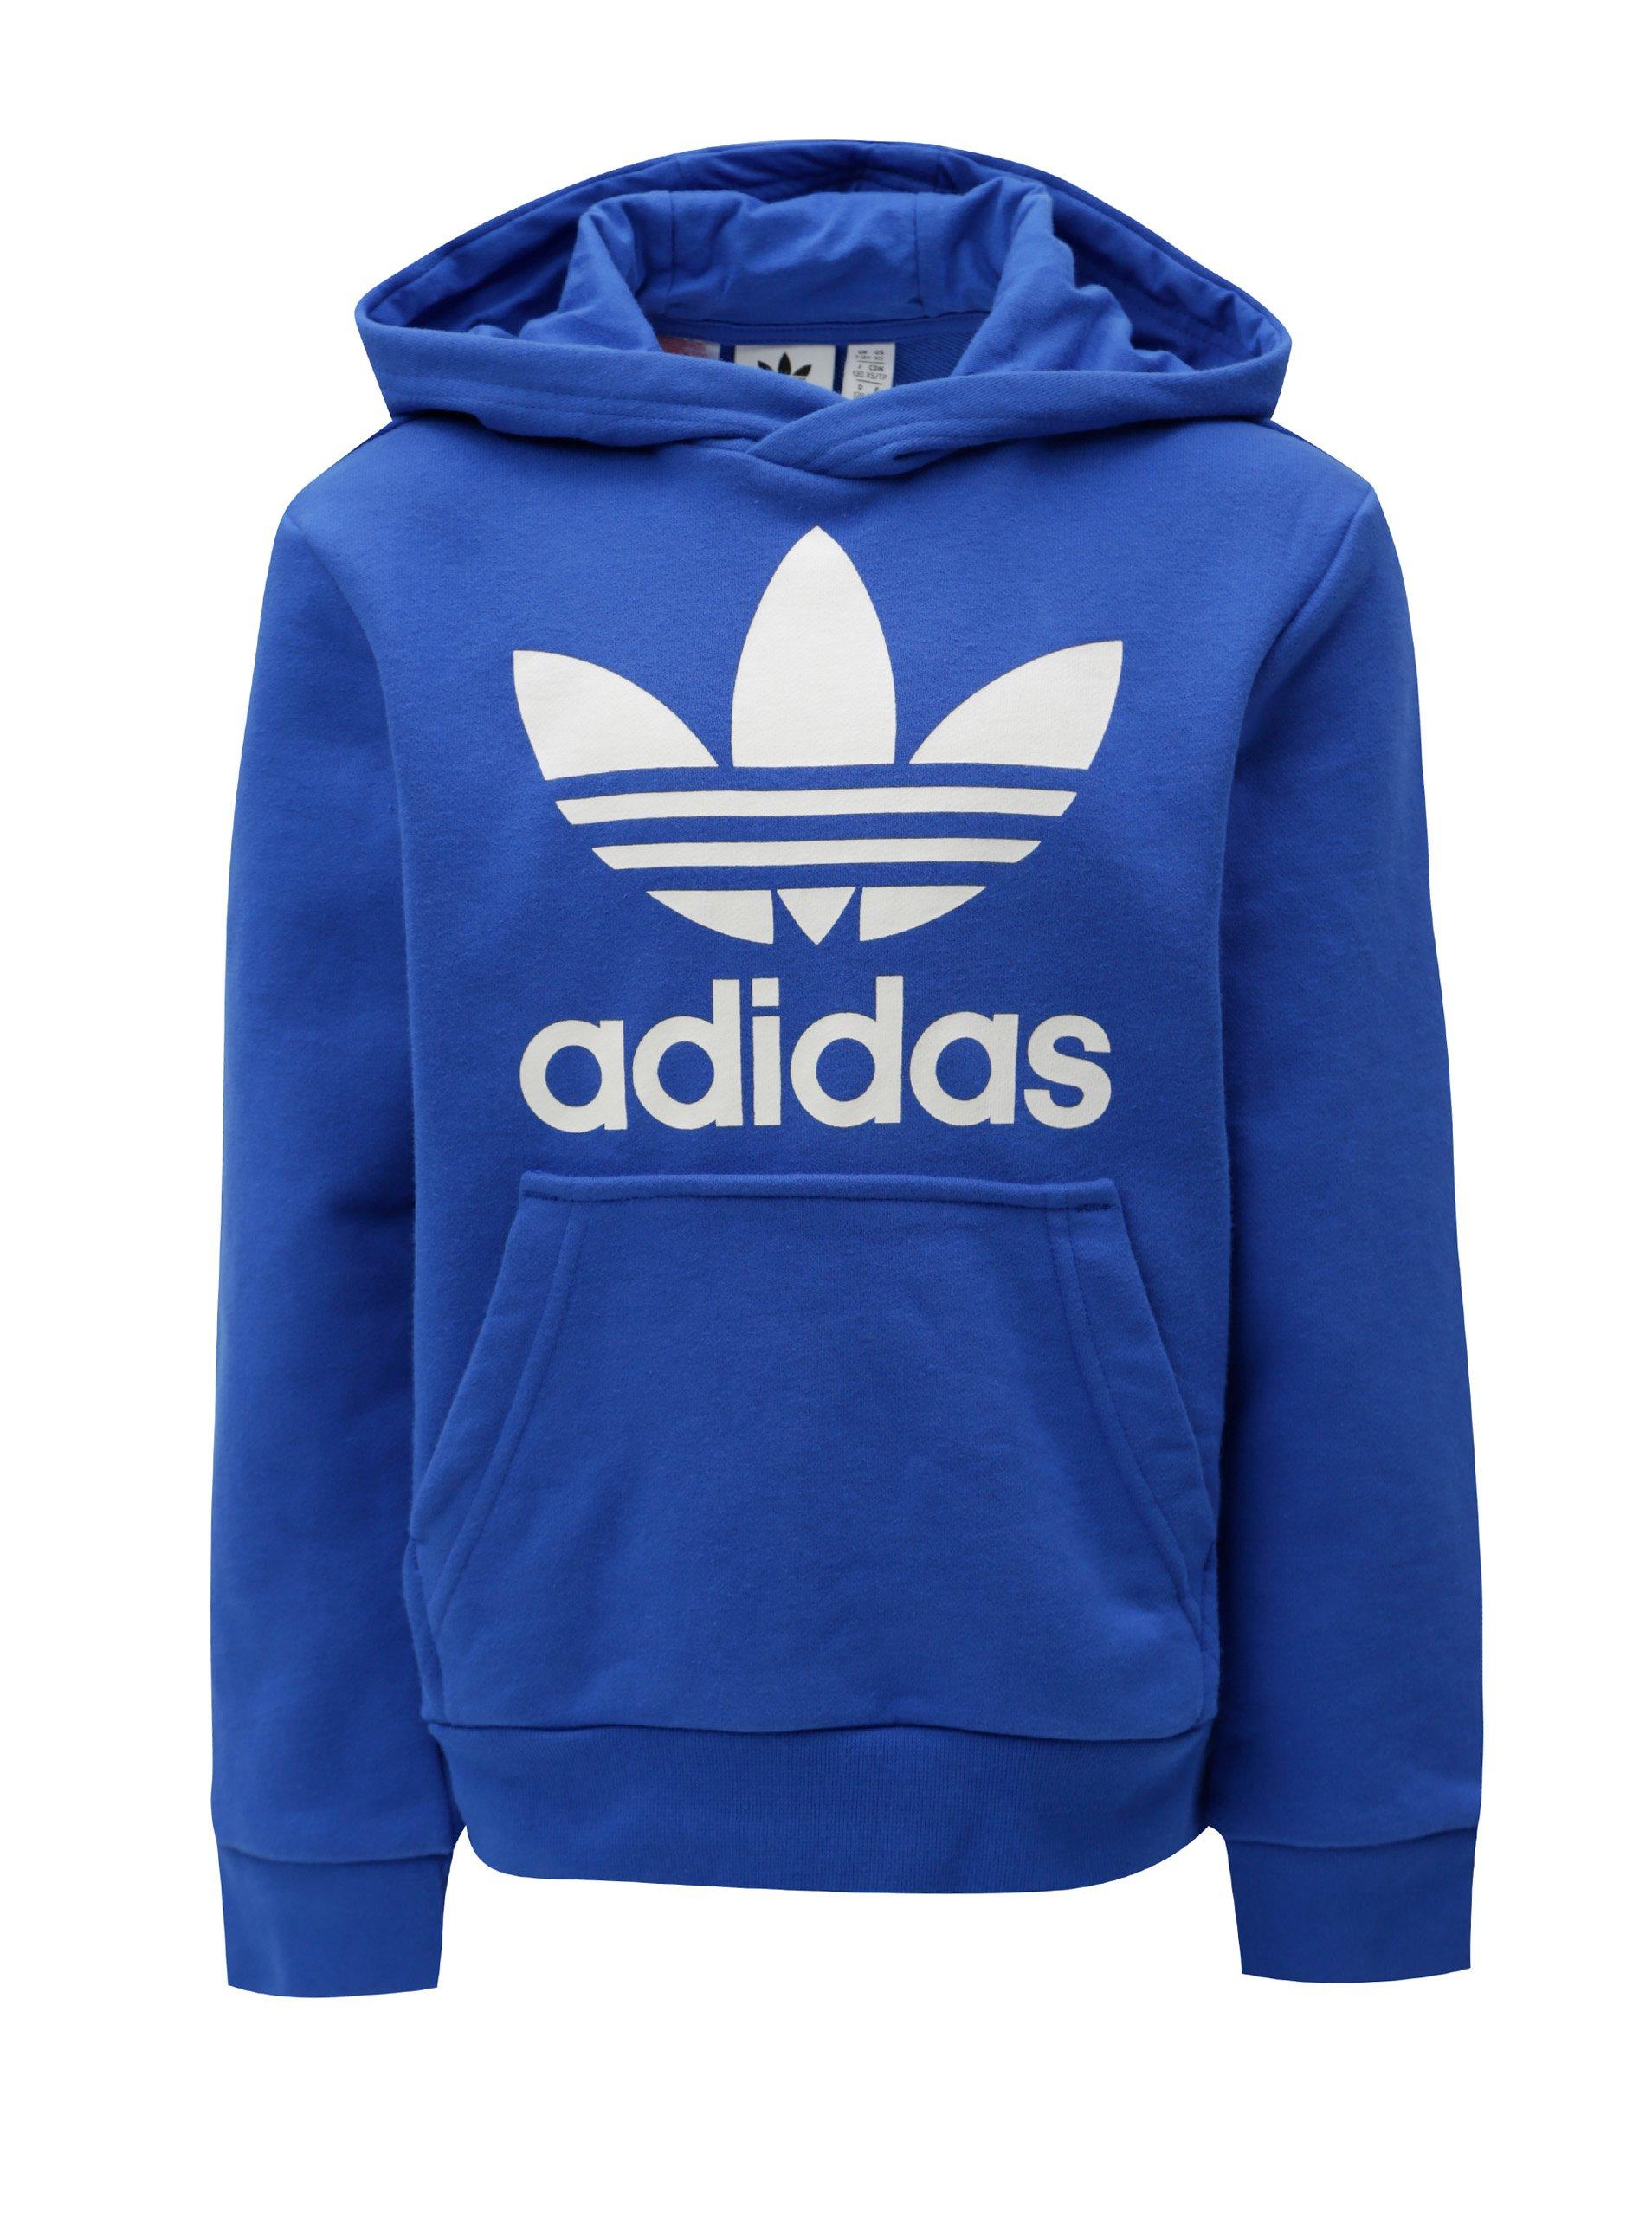 45227aceb Modrá chlapčenská mikina s kapucňou a klokaním vreckom adidas Originals  Trefoil